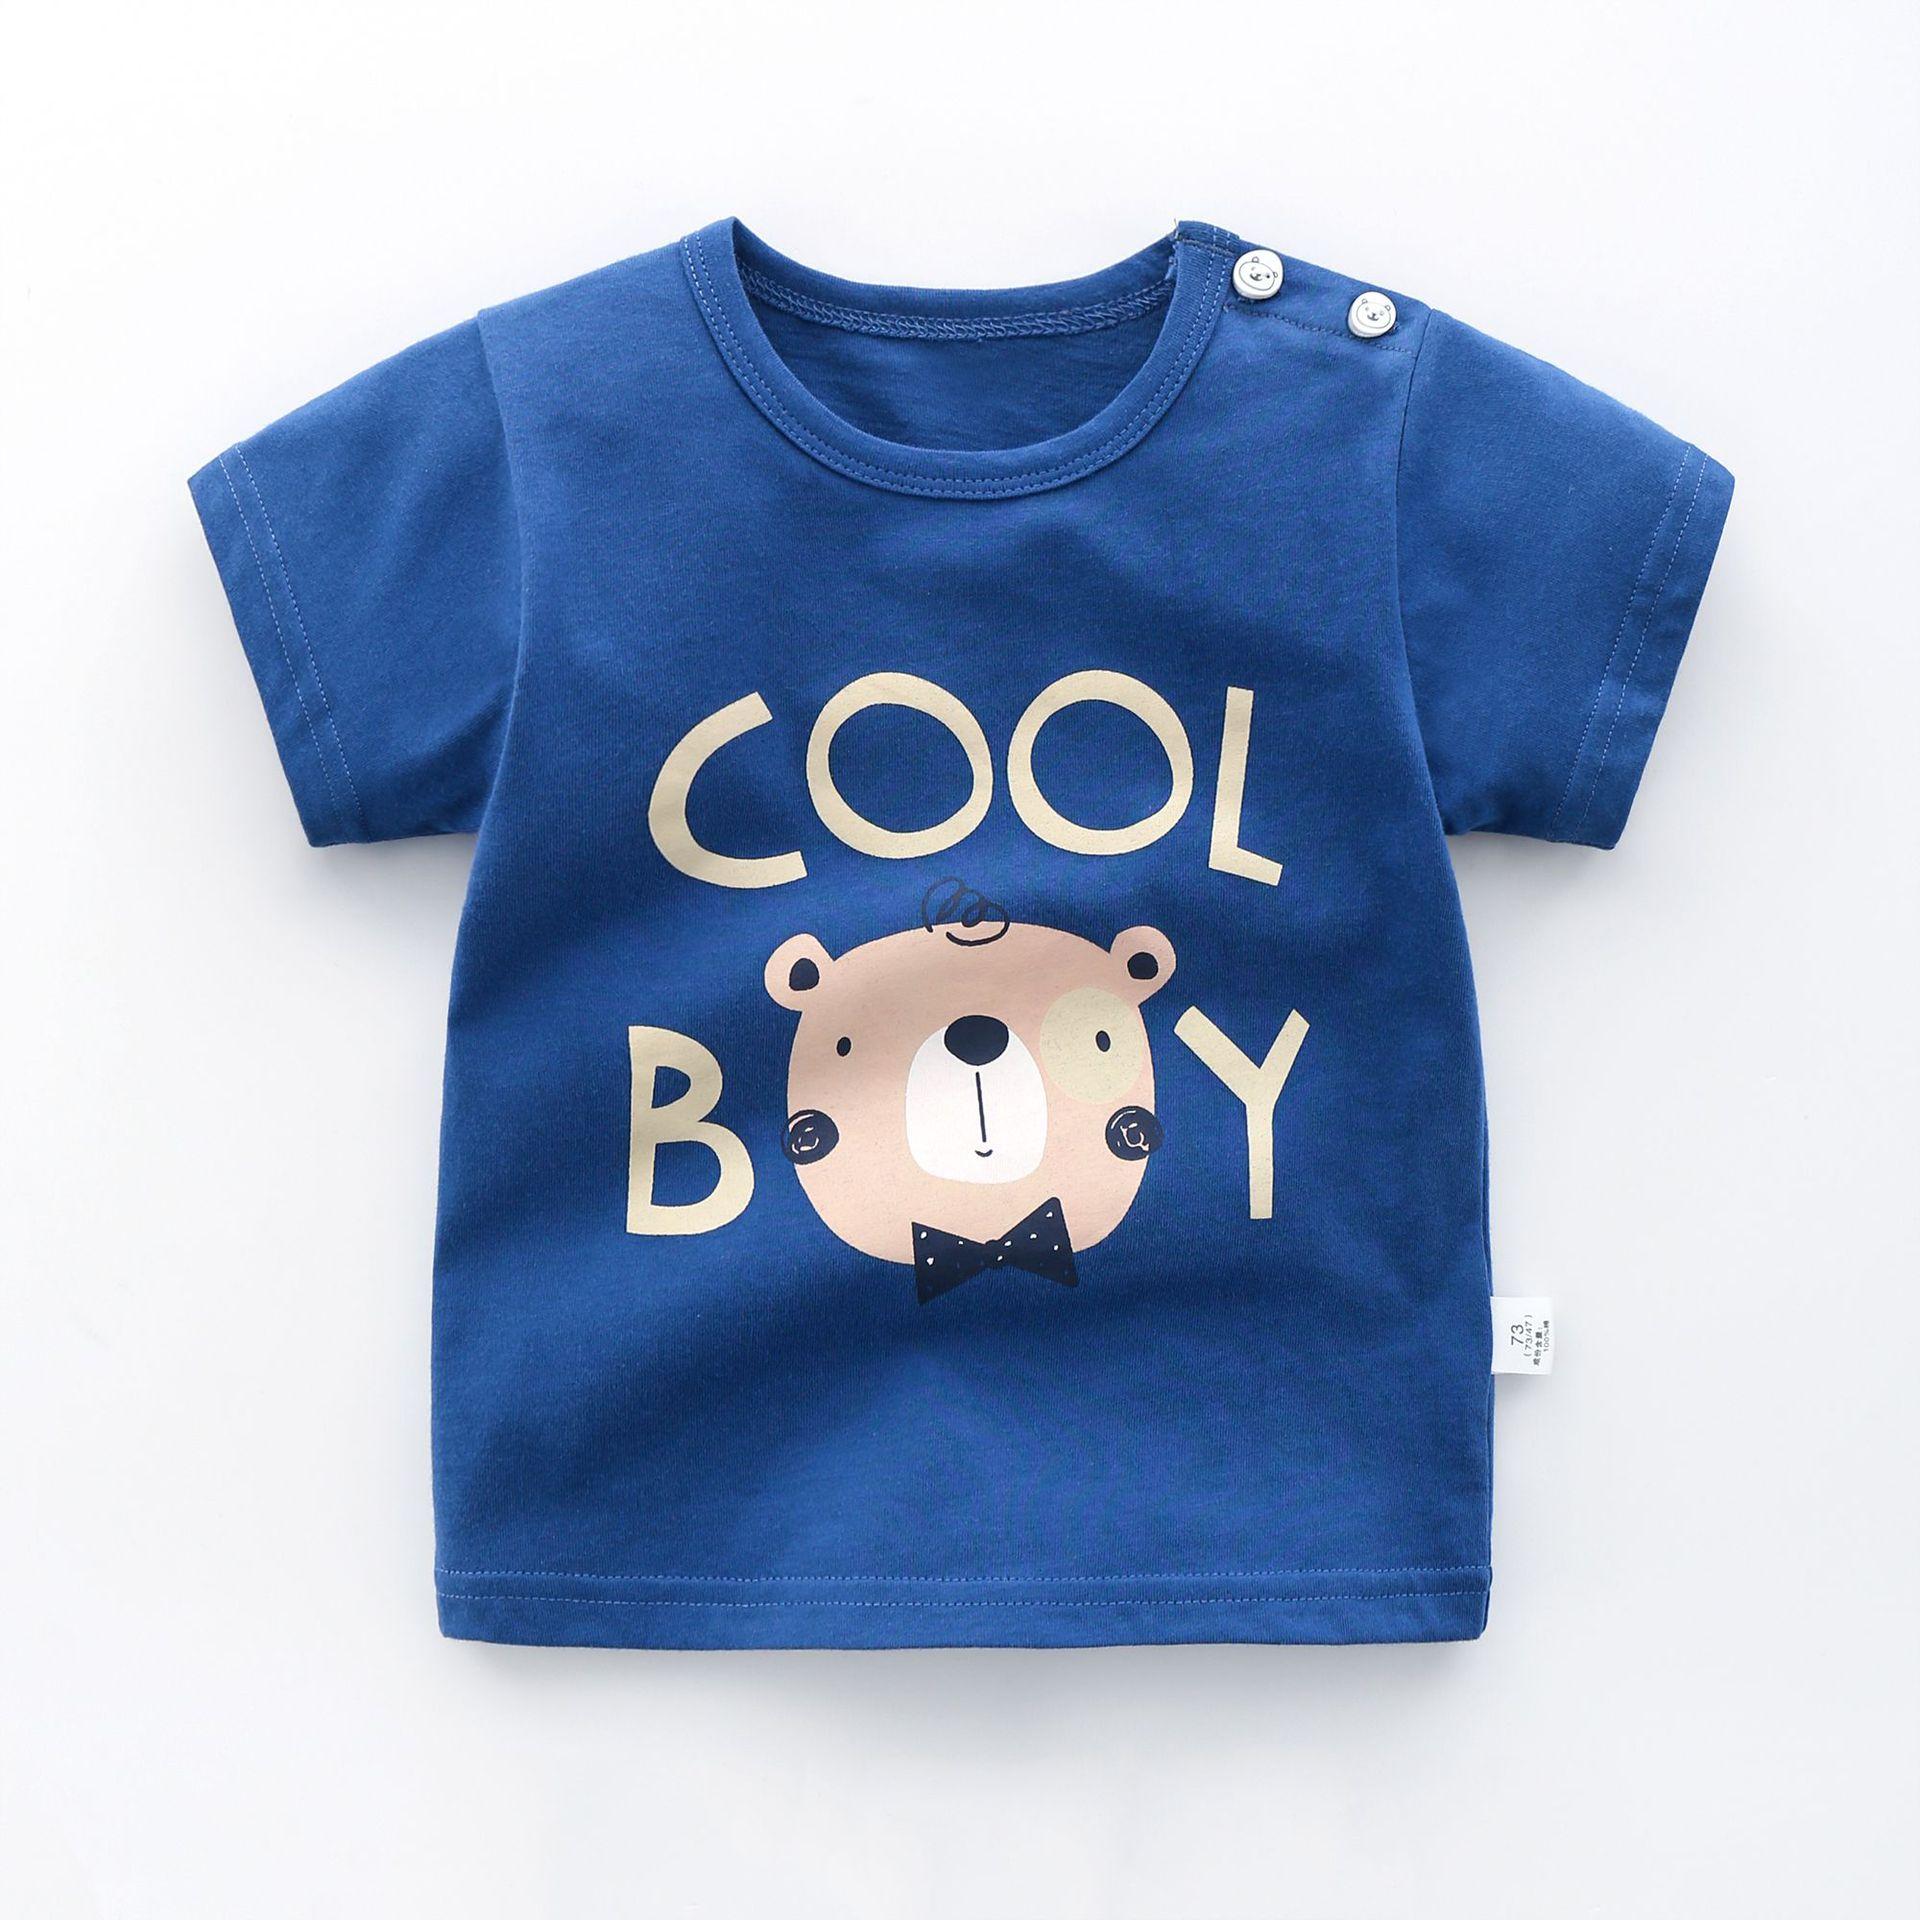 Summer Children's Wear Baby Kids T Shirts Girls Boys Clothes Tshirt Cotton Cartoon Printing Tops T-shirt Children Clothing-1